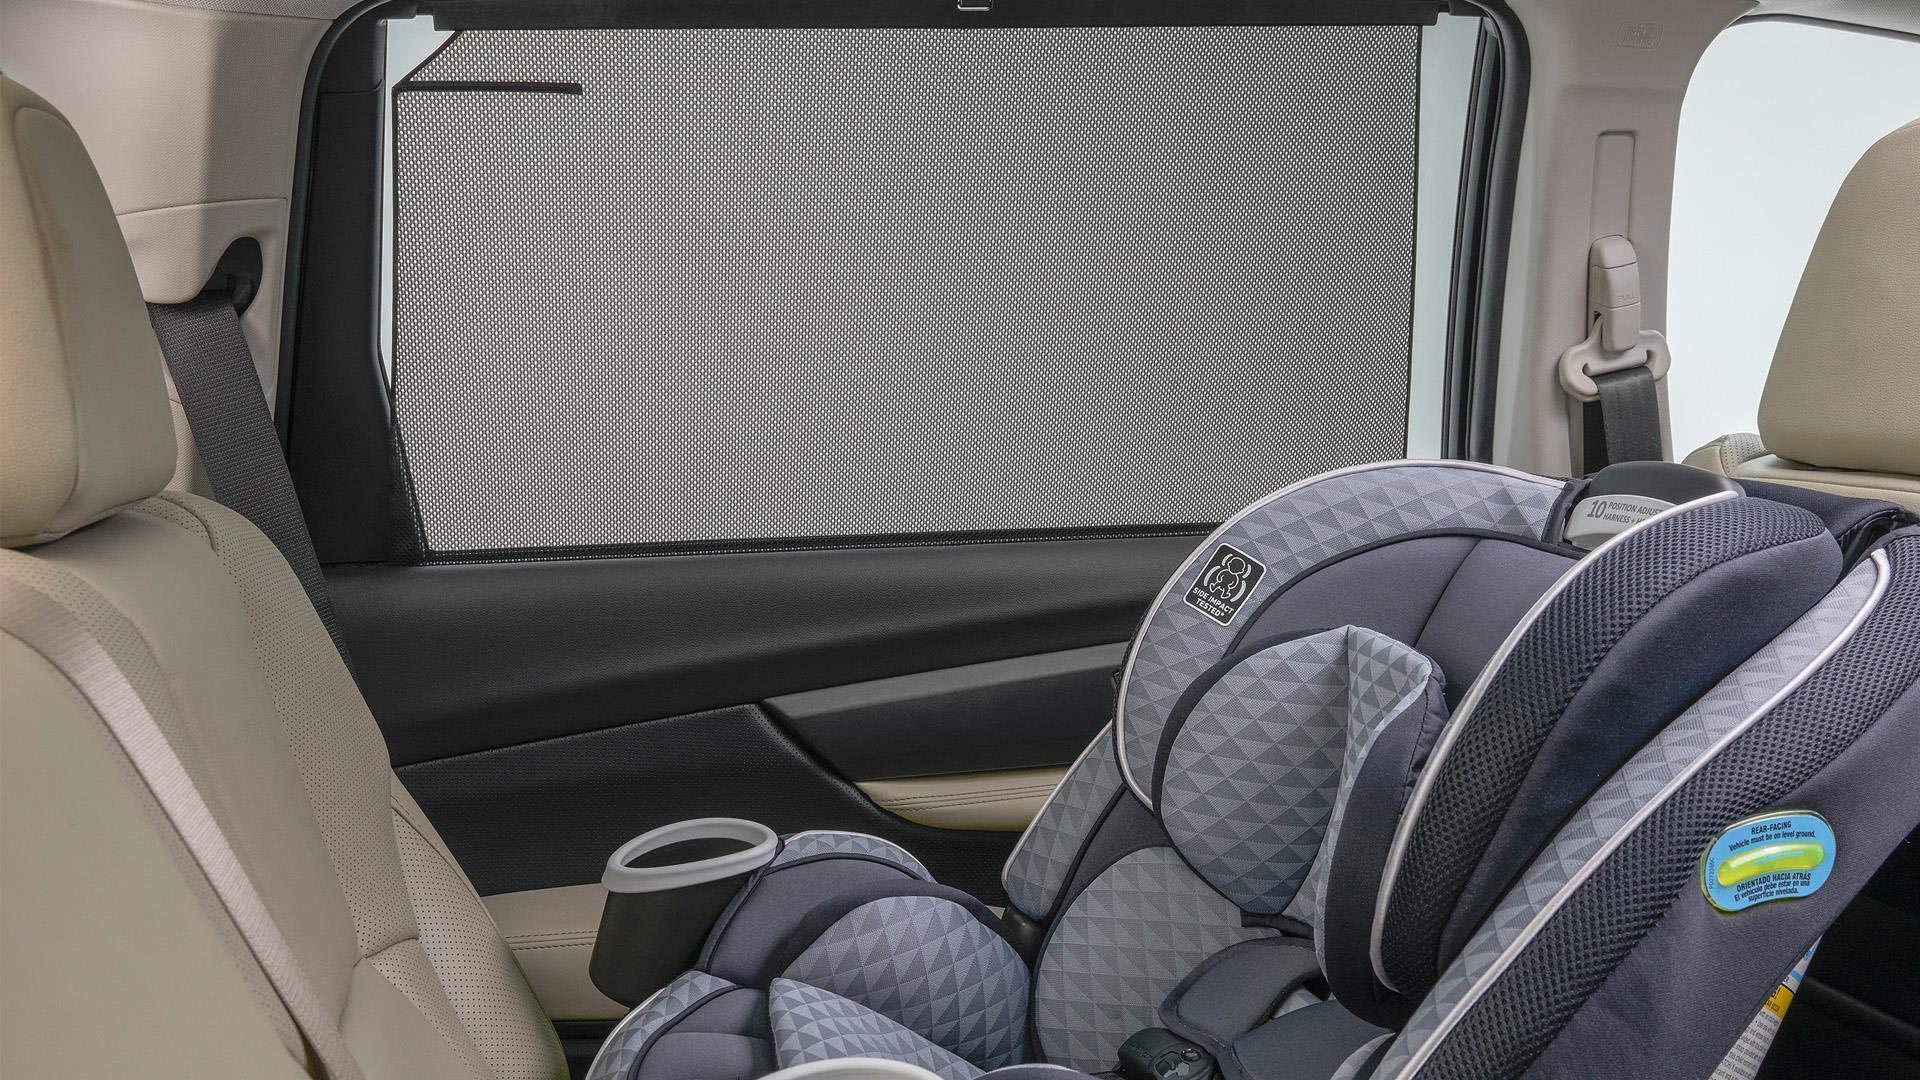 SUBARU 2019 Ascent 2nd Row Window Sunshade Set of Two New F501SXC000 Genuine by SUBARU (Image #2)